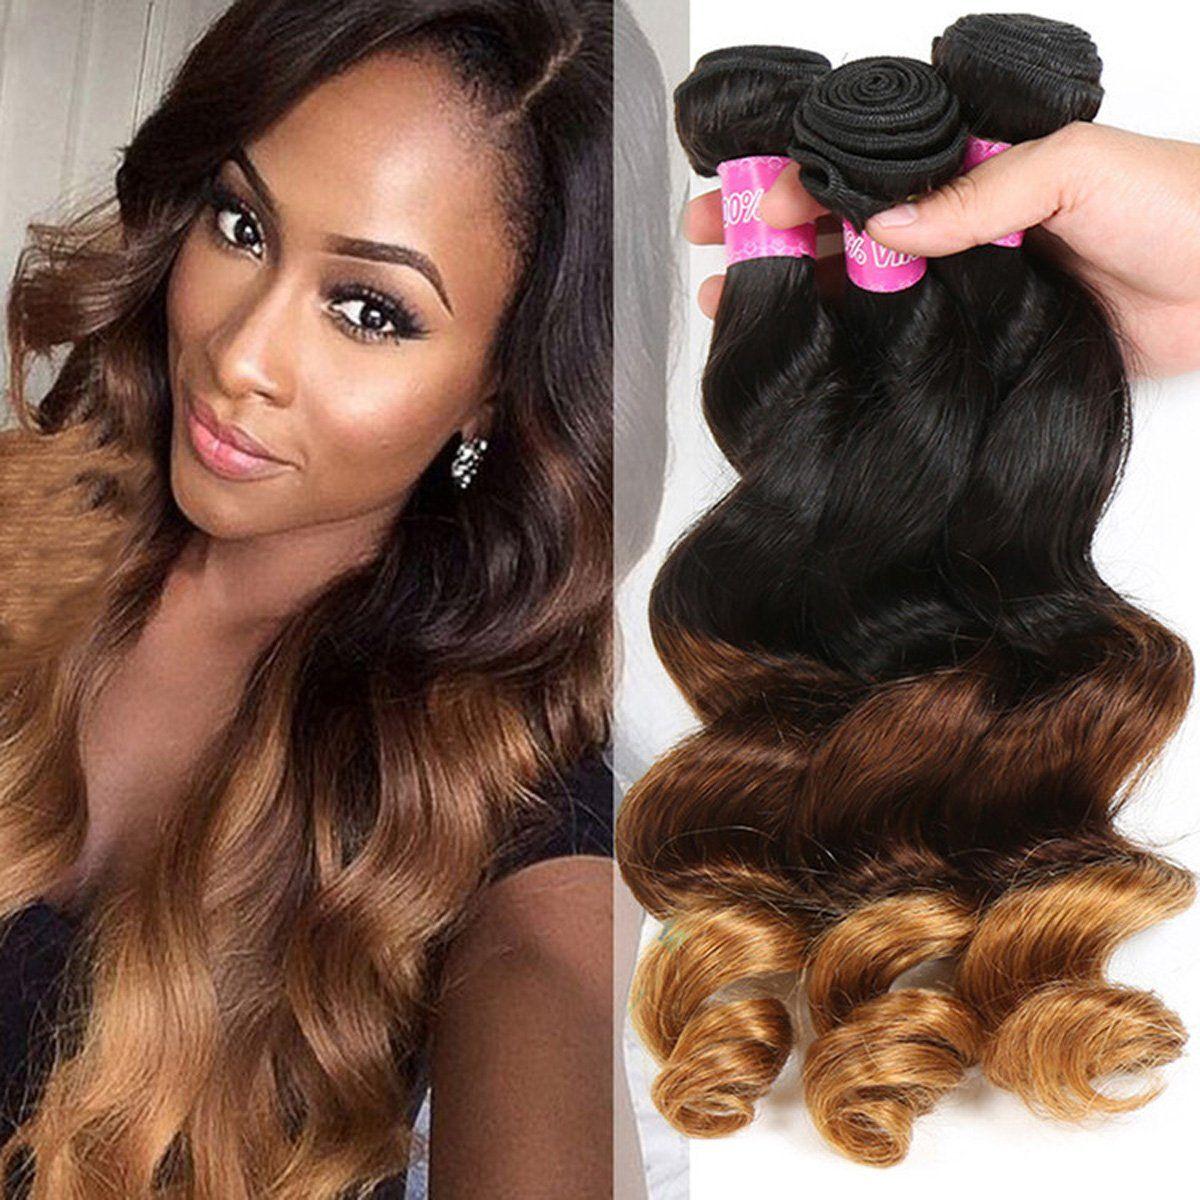 Virgin Brazilian Loose Wave Weave Real Human Hair Grade 7a Ombre